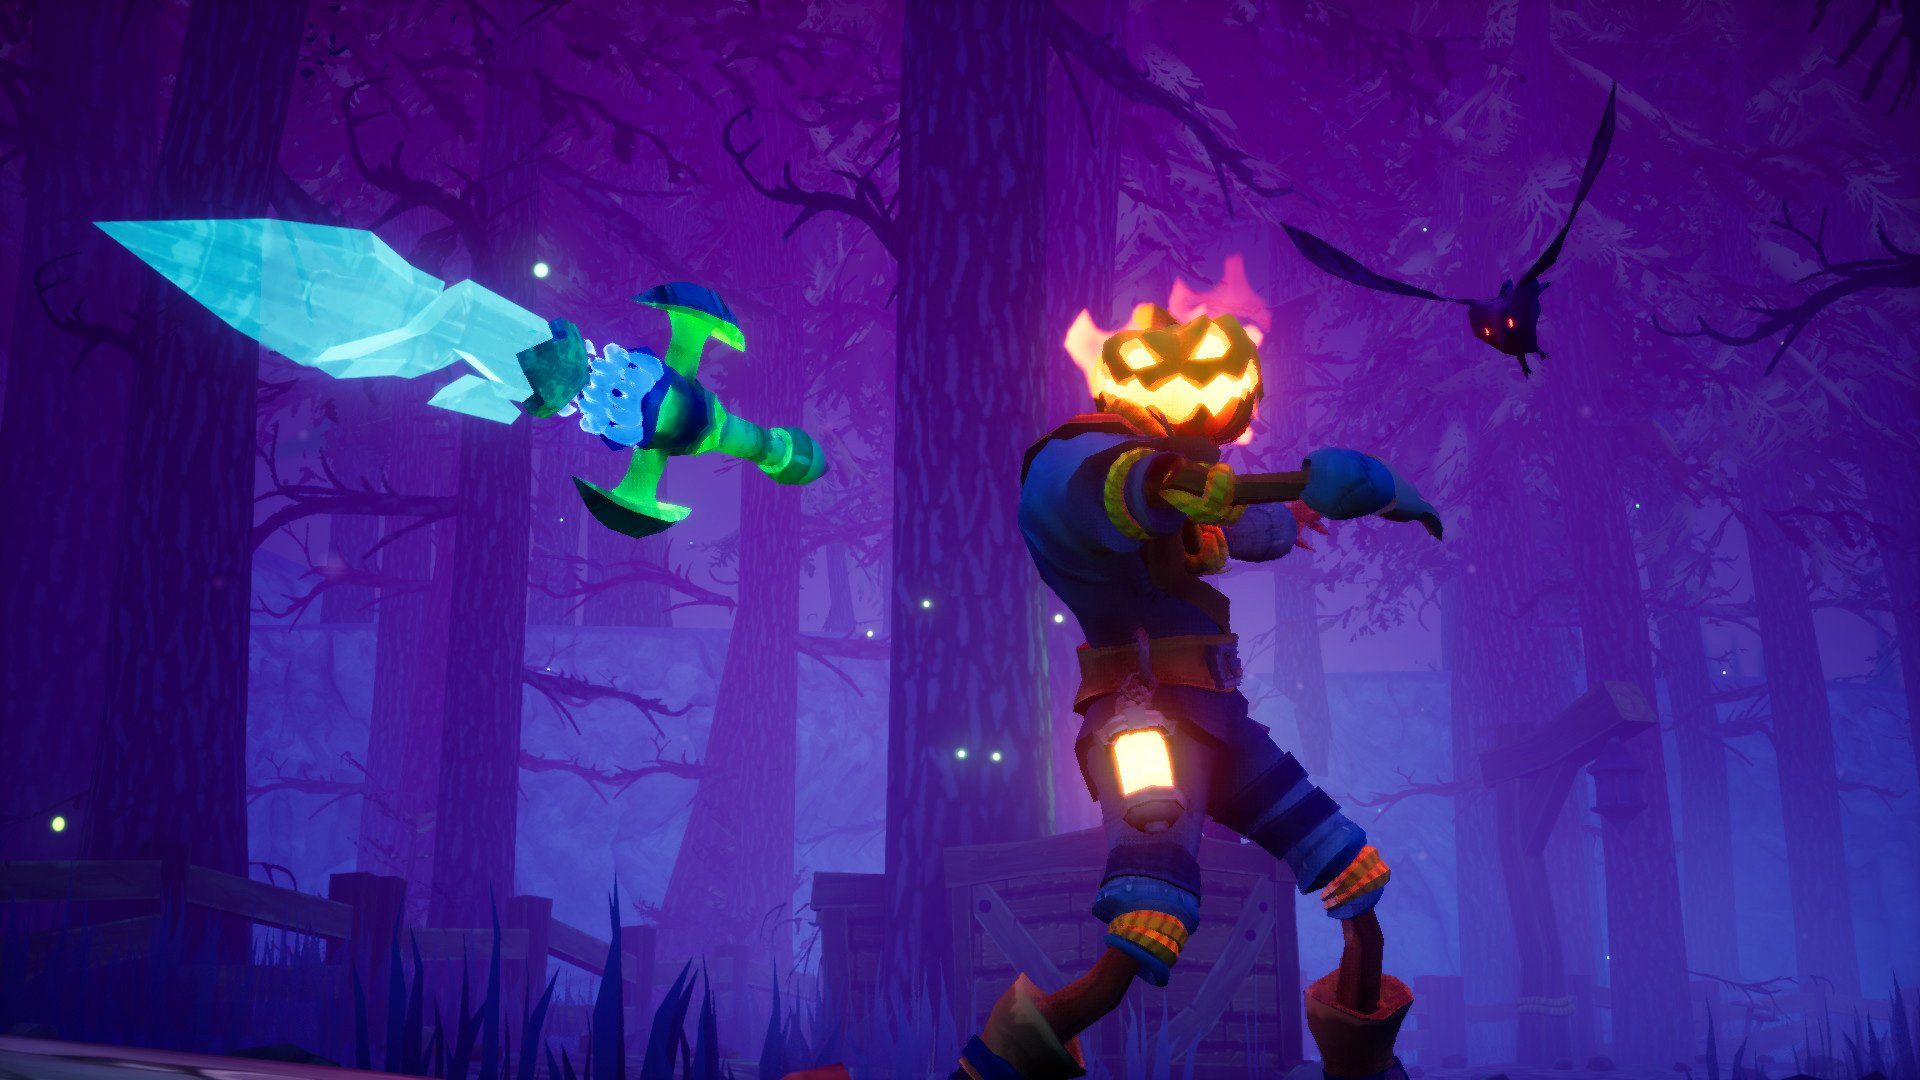 Pumpkin Jack wants to recapture the Jak and Daxter vibe screenshot